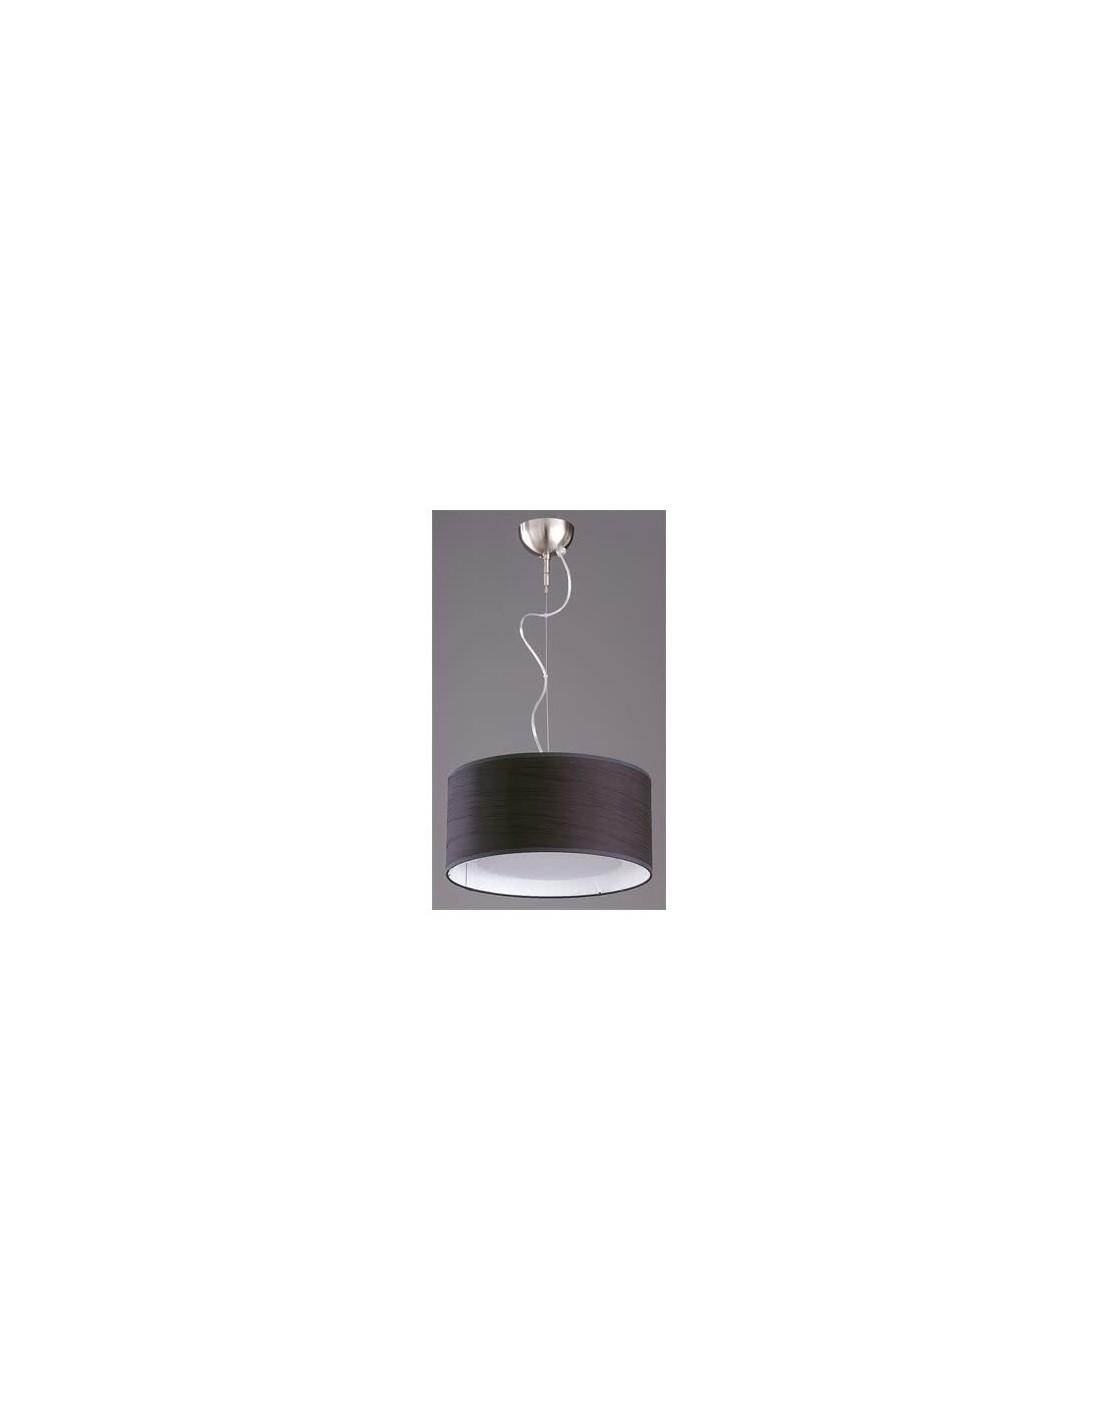 acheter ampoules speciales vintage 71402251. Black Bedroom Furniture Sets. Home Design Ideas